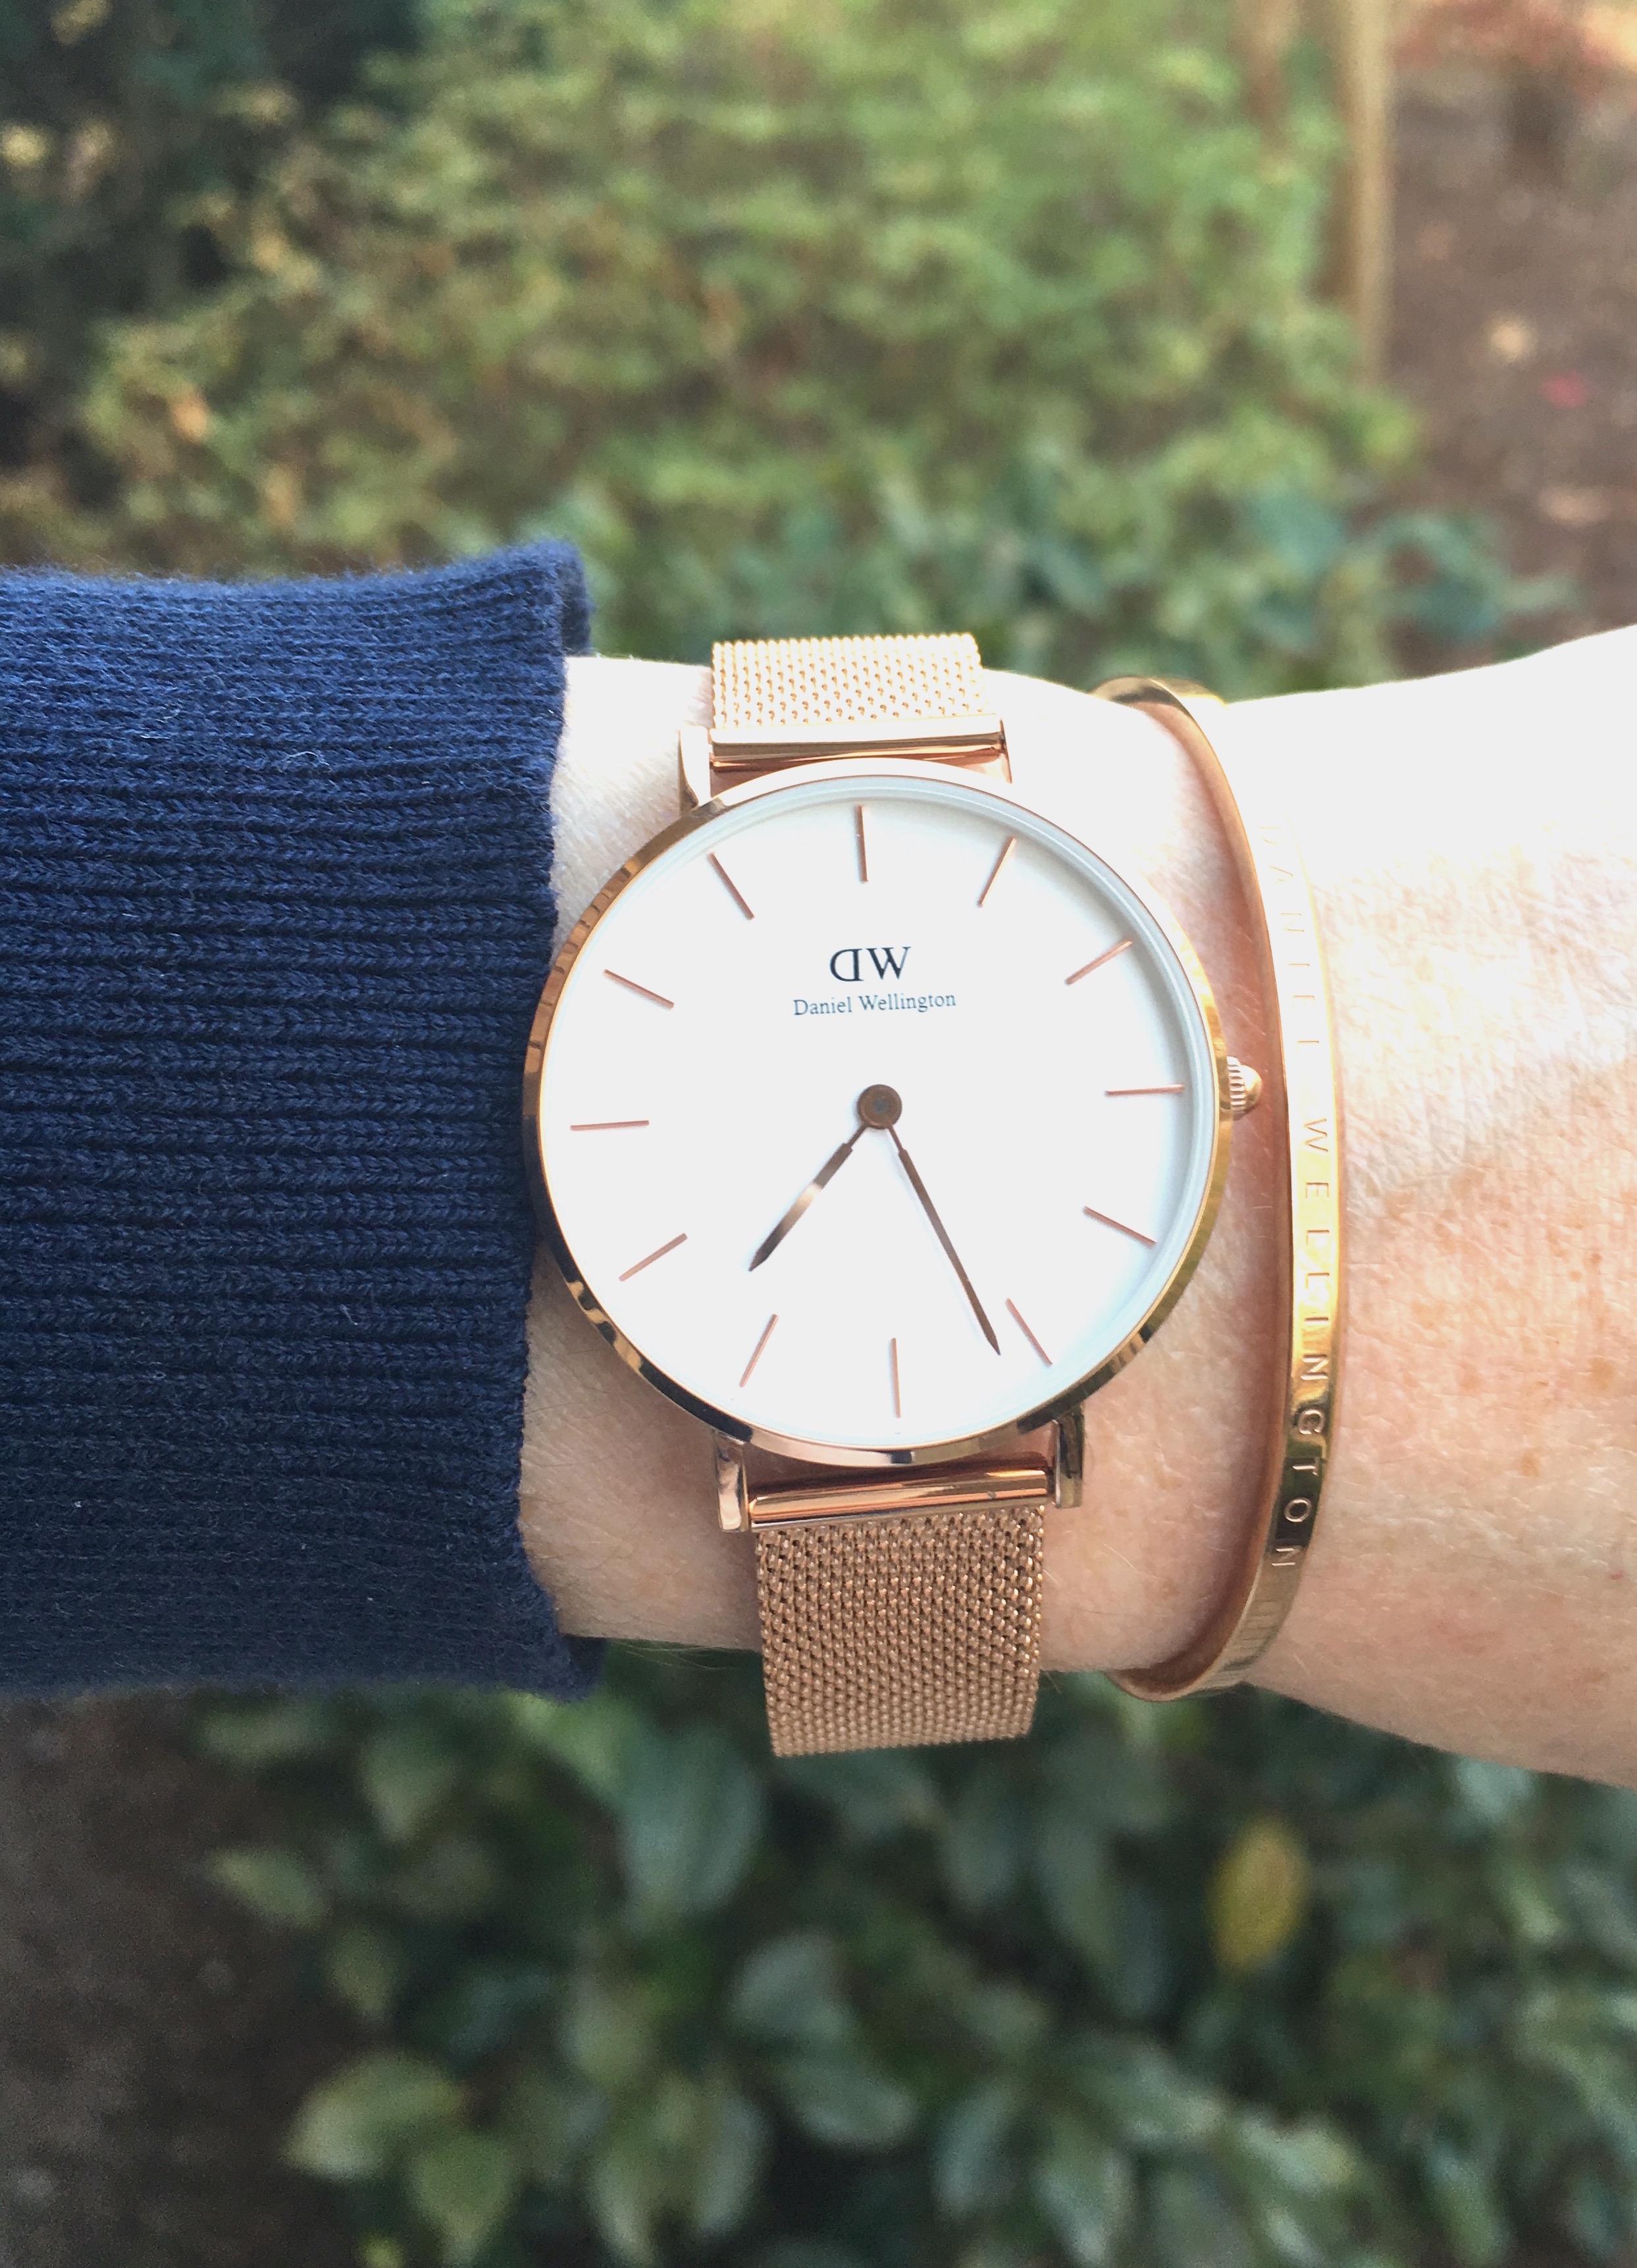 A New Daniel Wellington Watch  Classy Yet Trendy